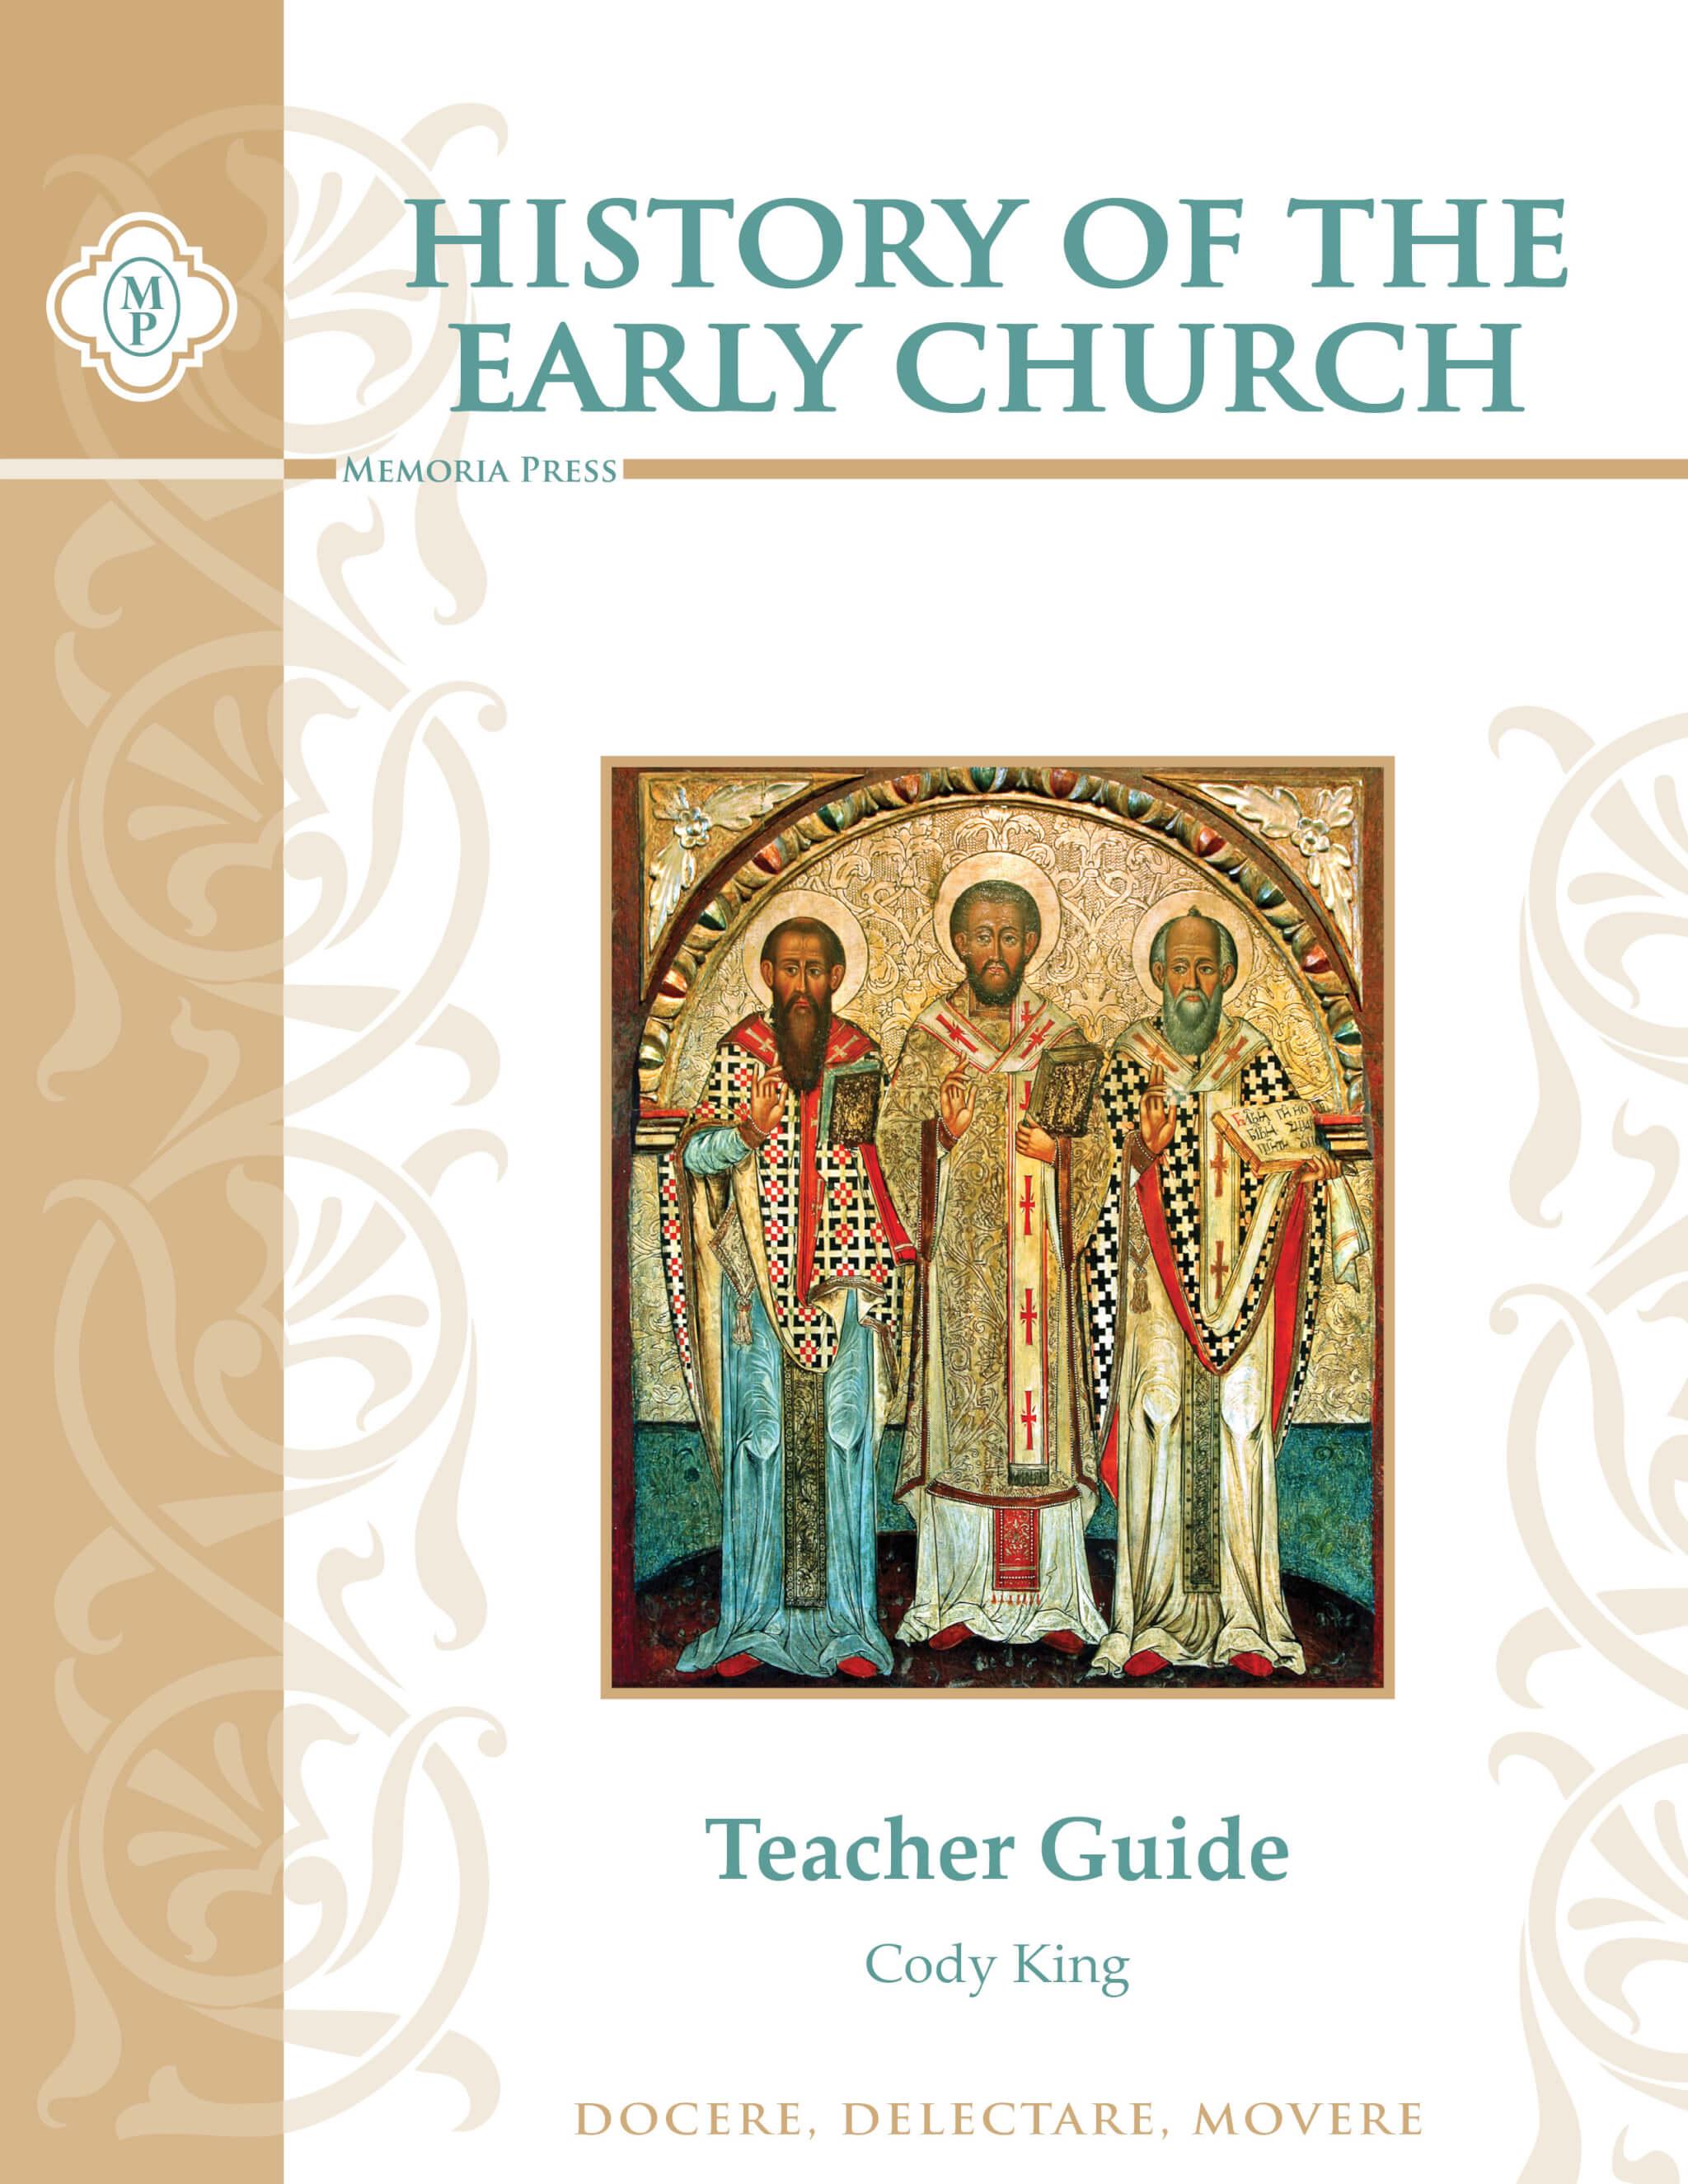 History of the Early Church Teacher Guide | Memoria Press